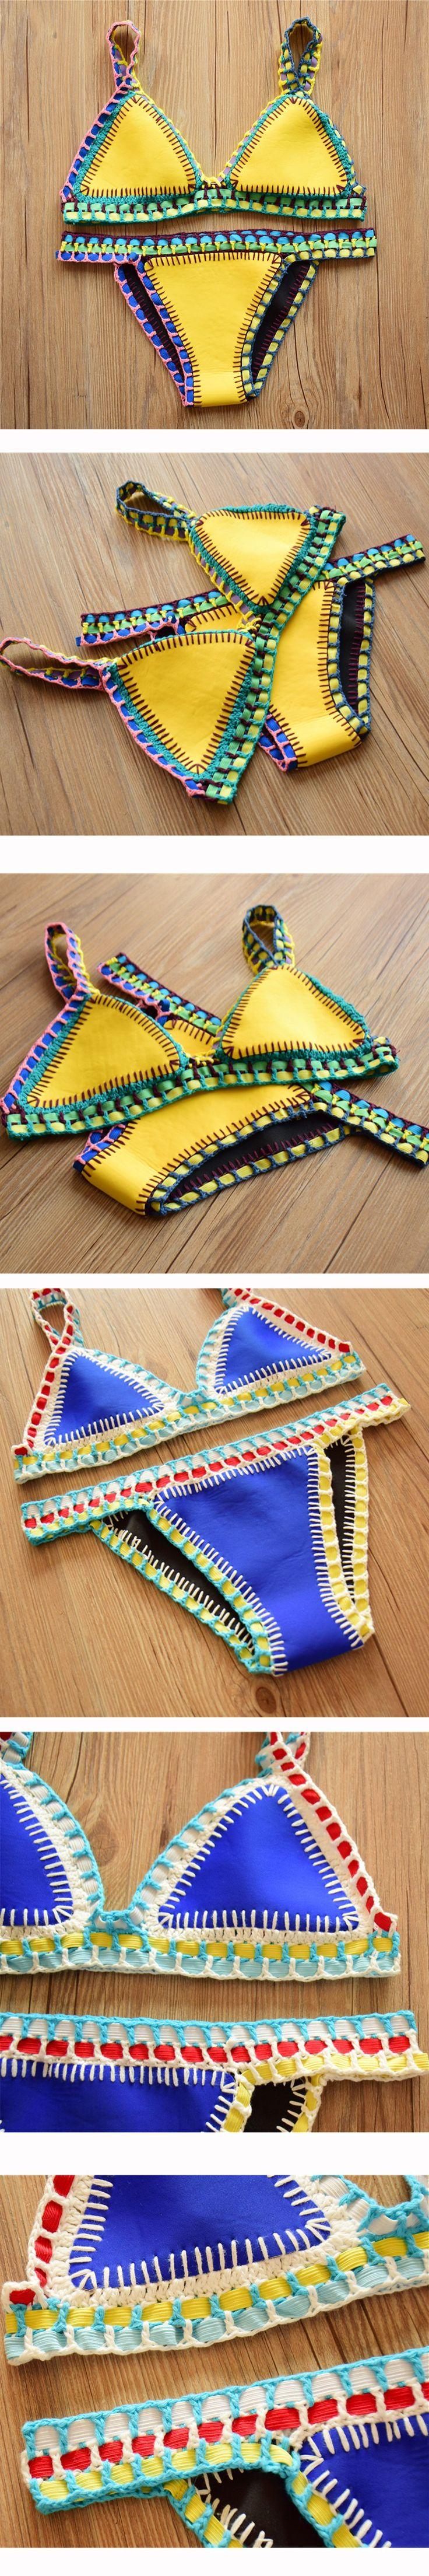 2016 Crochet Women Swimwear Bikini Neoprene Bikinis Swimsuit Maillot De Bian Bathing Suits Plus Size Triangle Bikini Brazilian $22.9